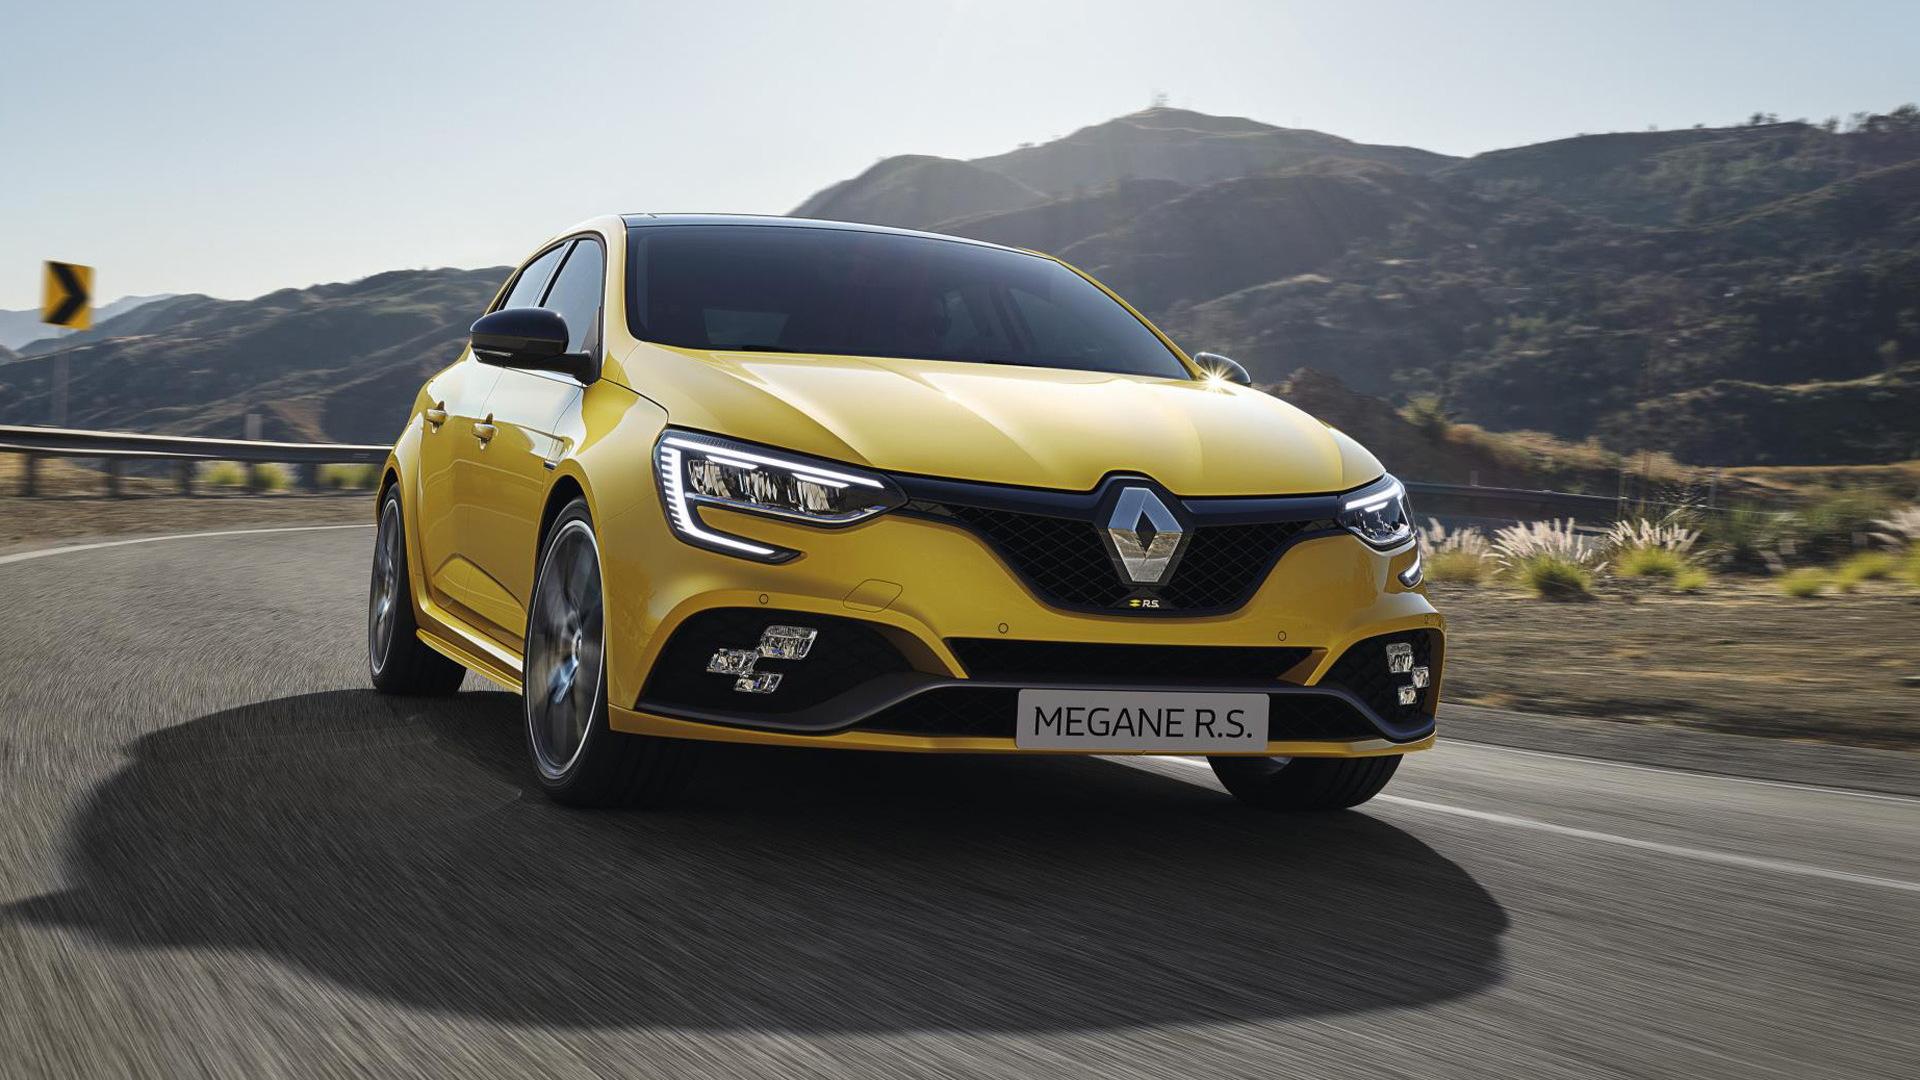 2020 Renault Megane RS